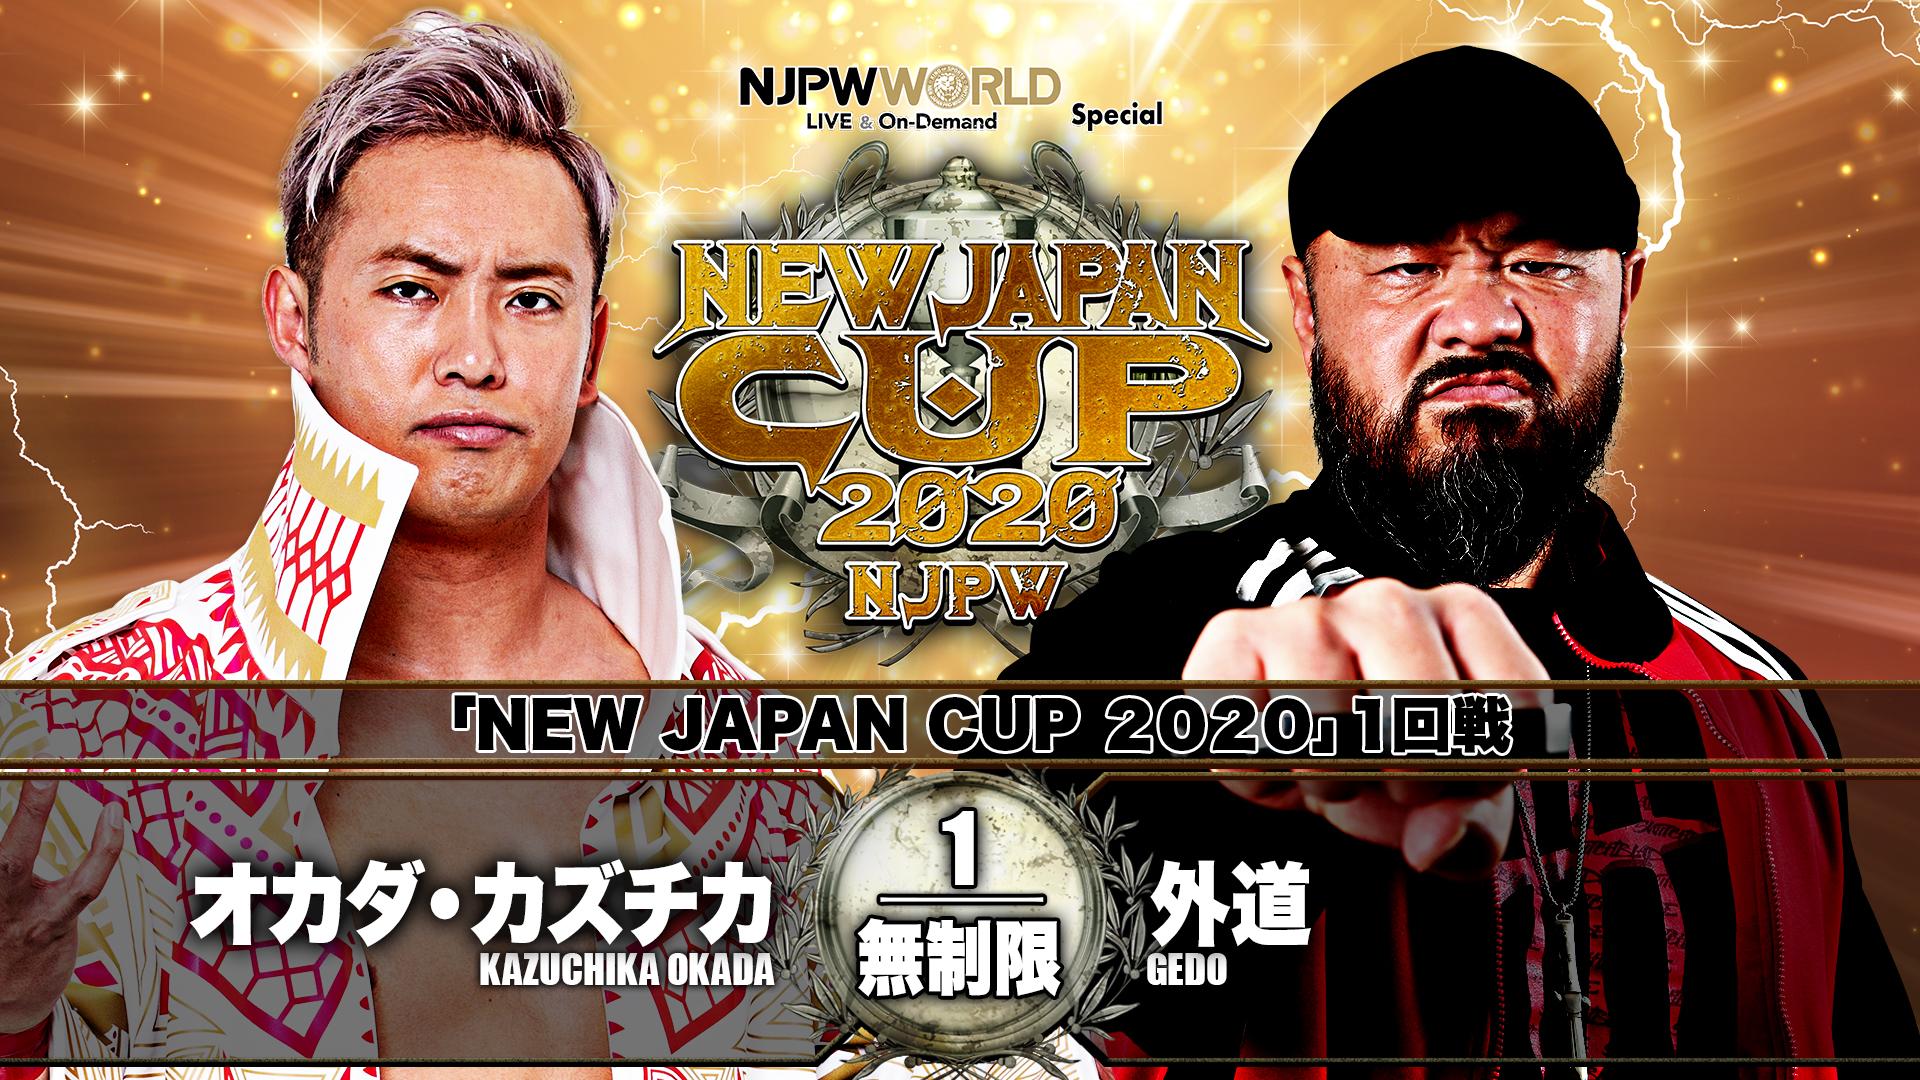 Cobertura: NJPW New Japan Cup 2020 – Day 2 – A vingança nunca é plena?